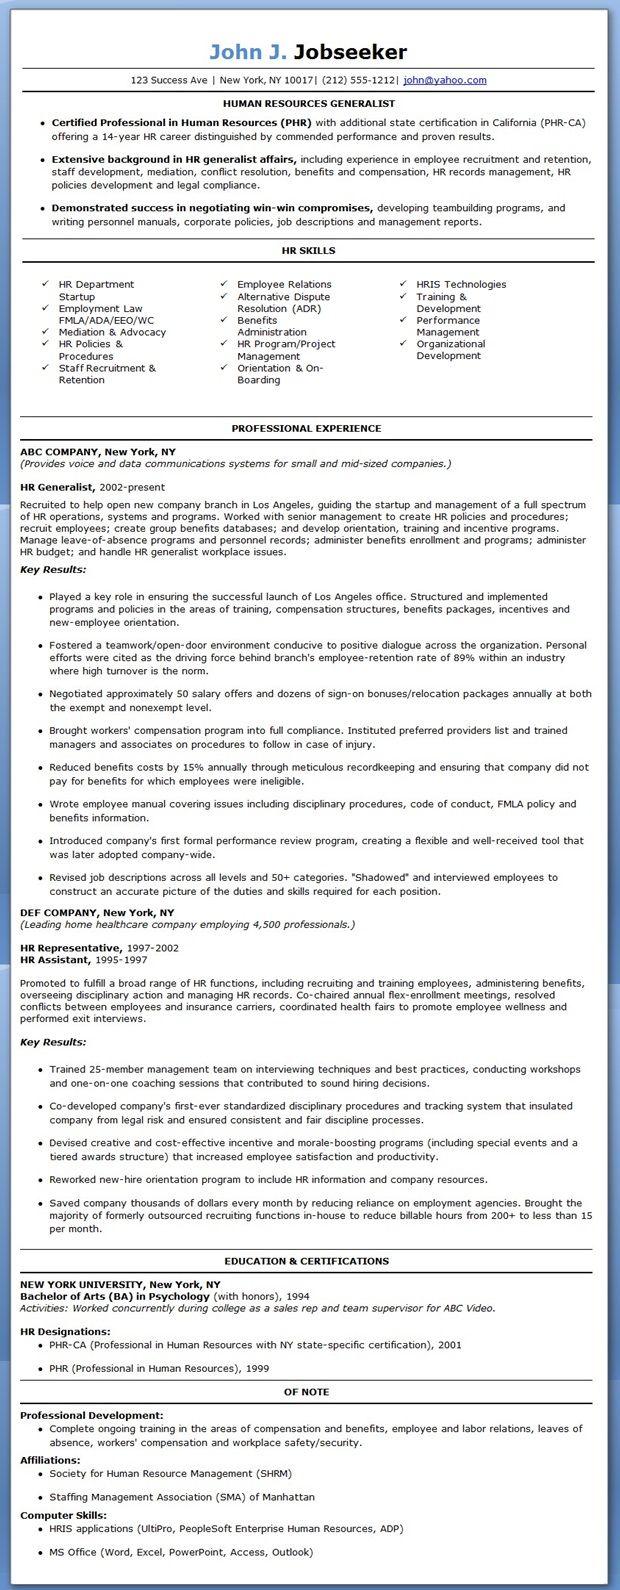 hr generalist resume examples creative resume design templates